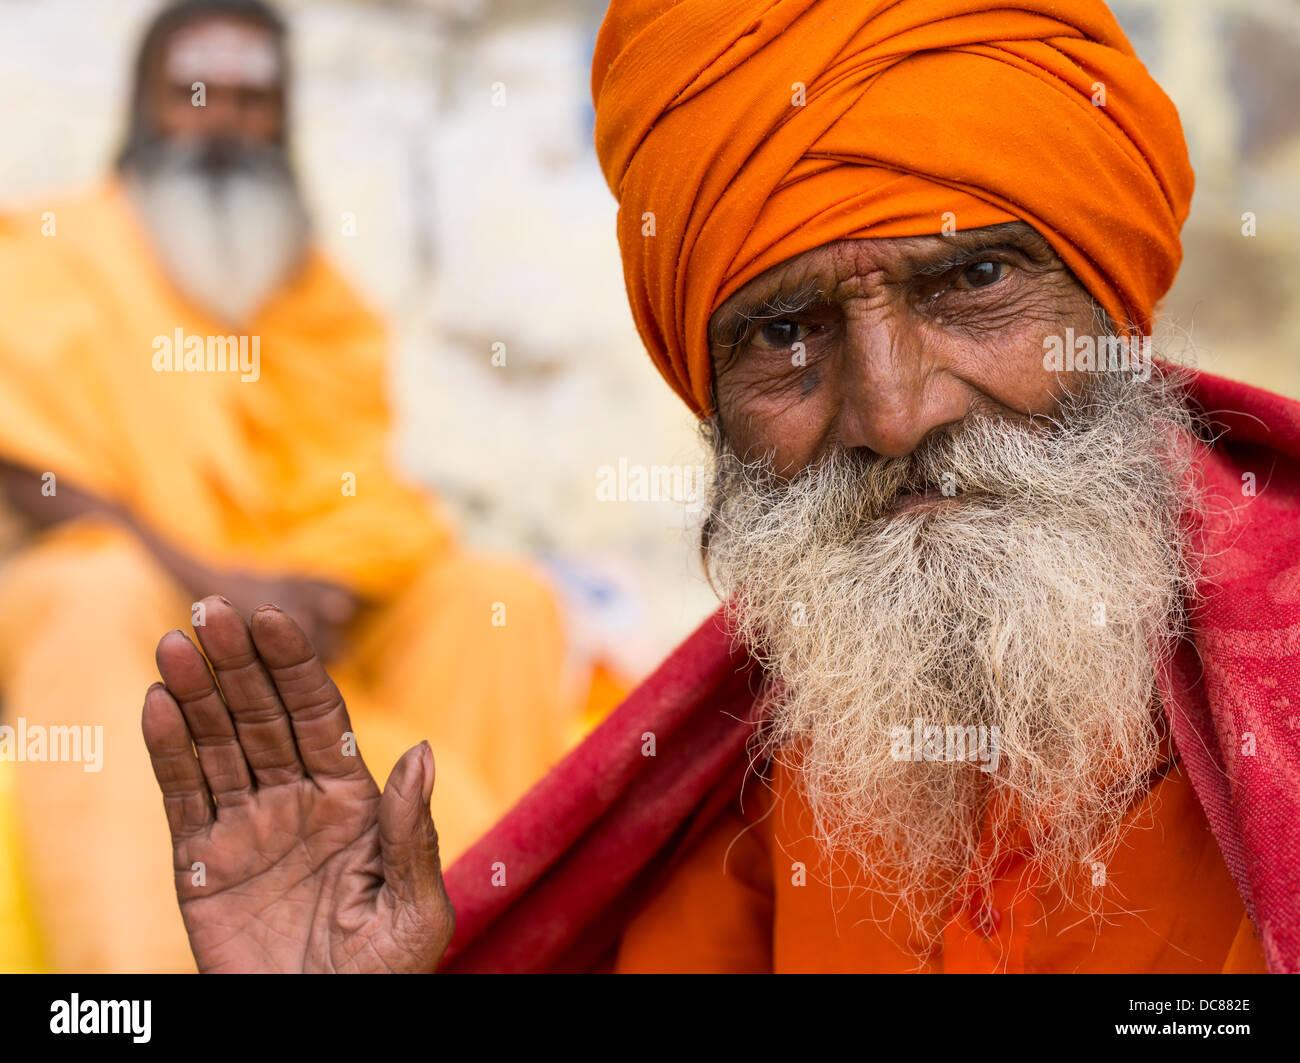 Sadhu holy man on the banks of the Ganges River - Varanasi, India Stock Photo